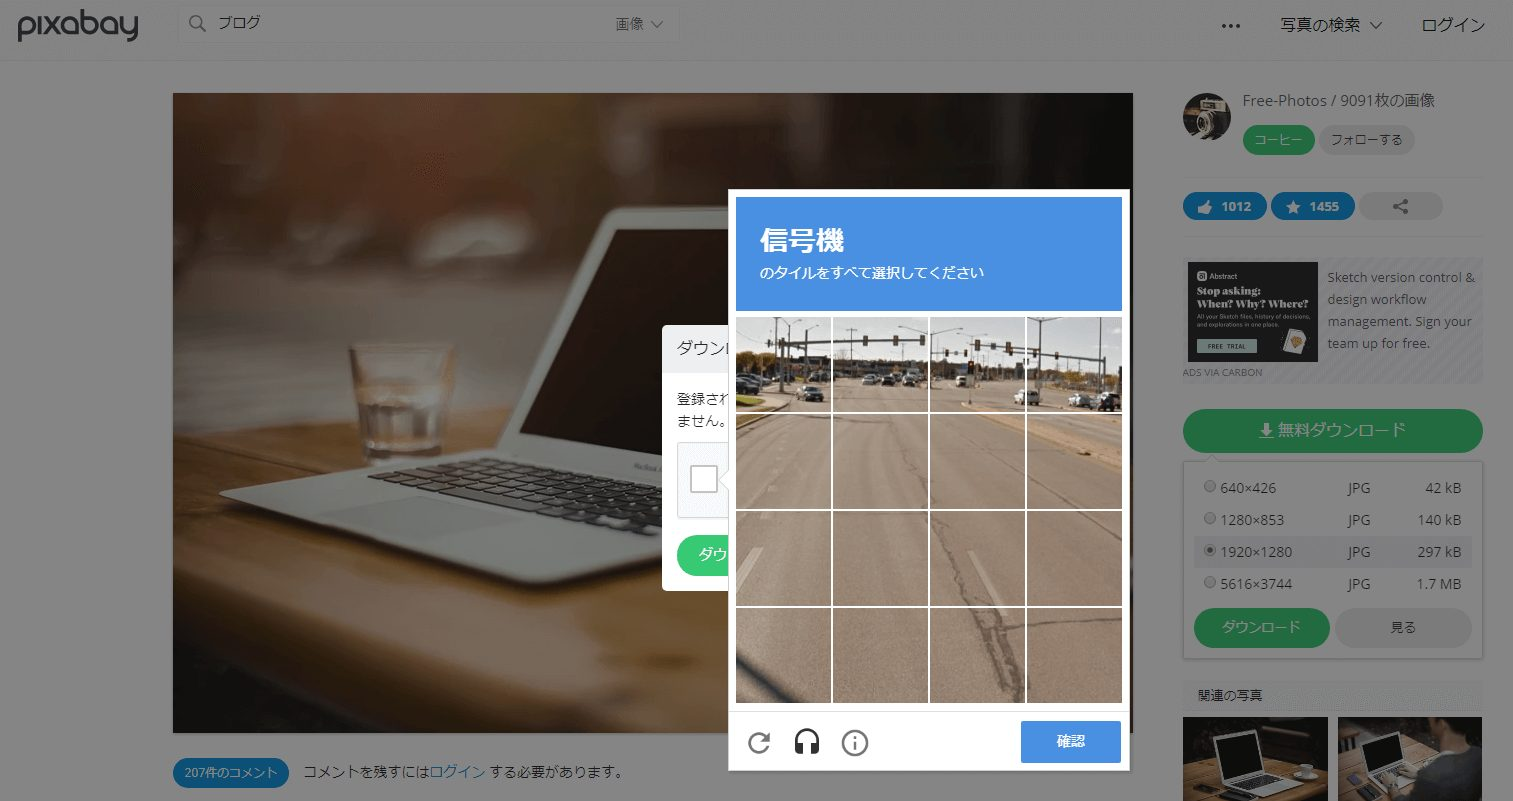 pixabay ロボット確認画面